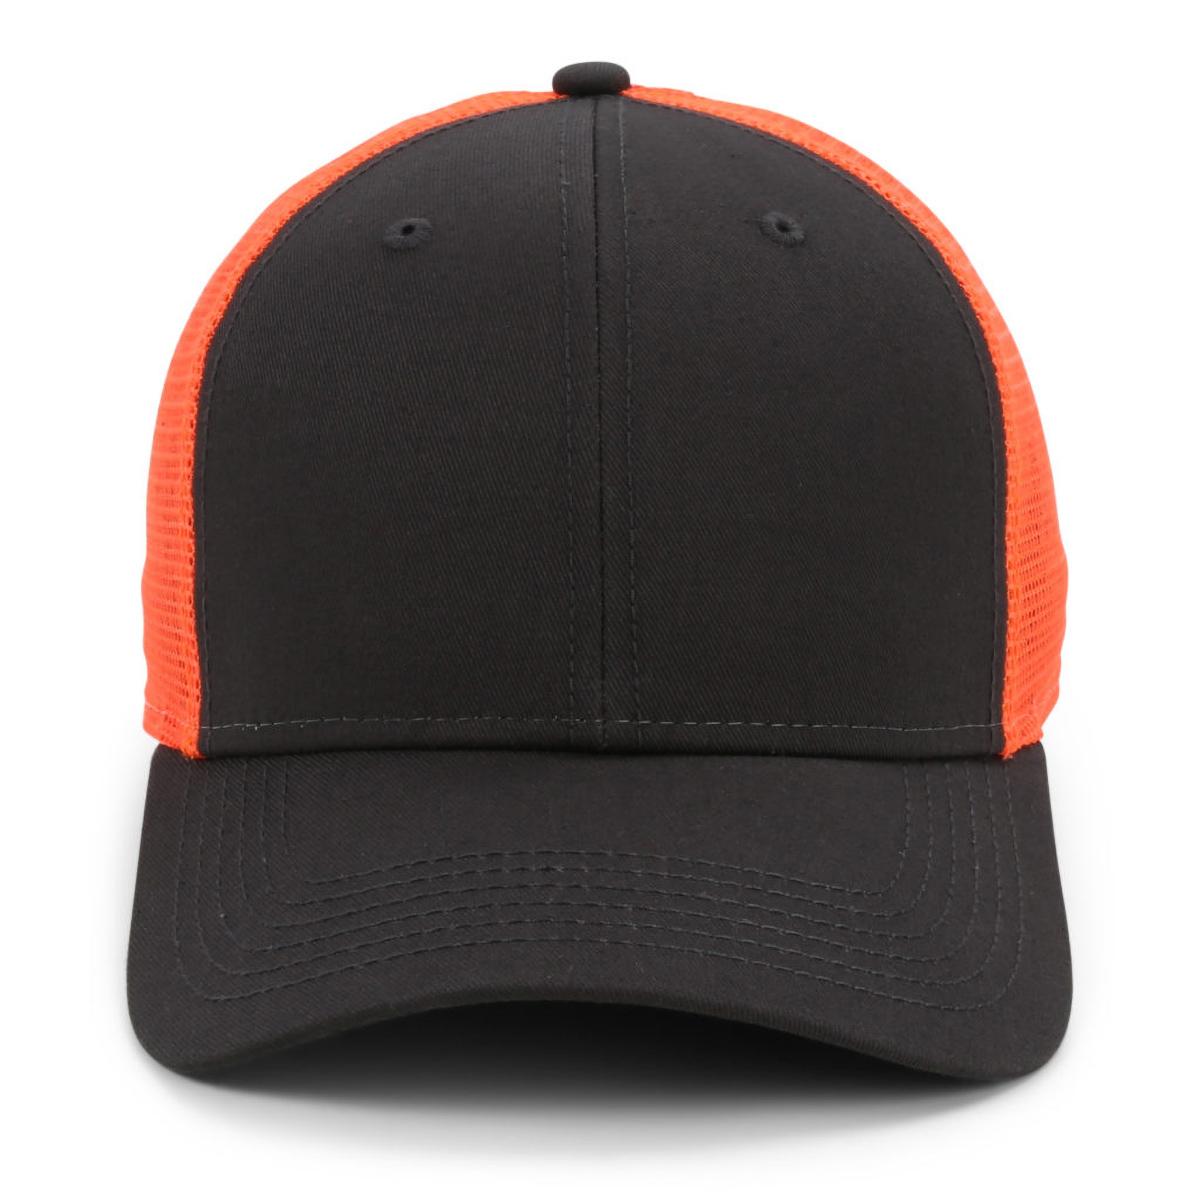 I200m charcoal neon orange 01 1024x1024